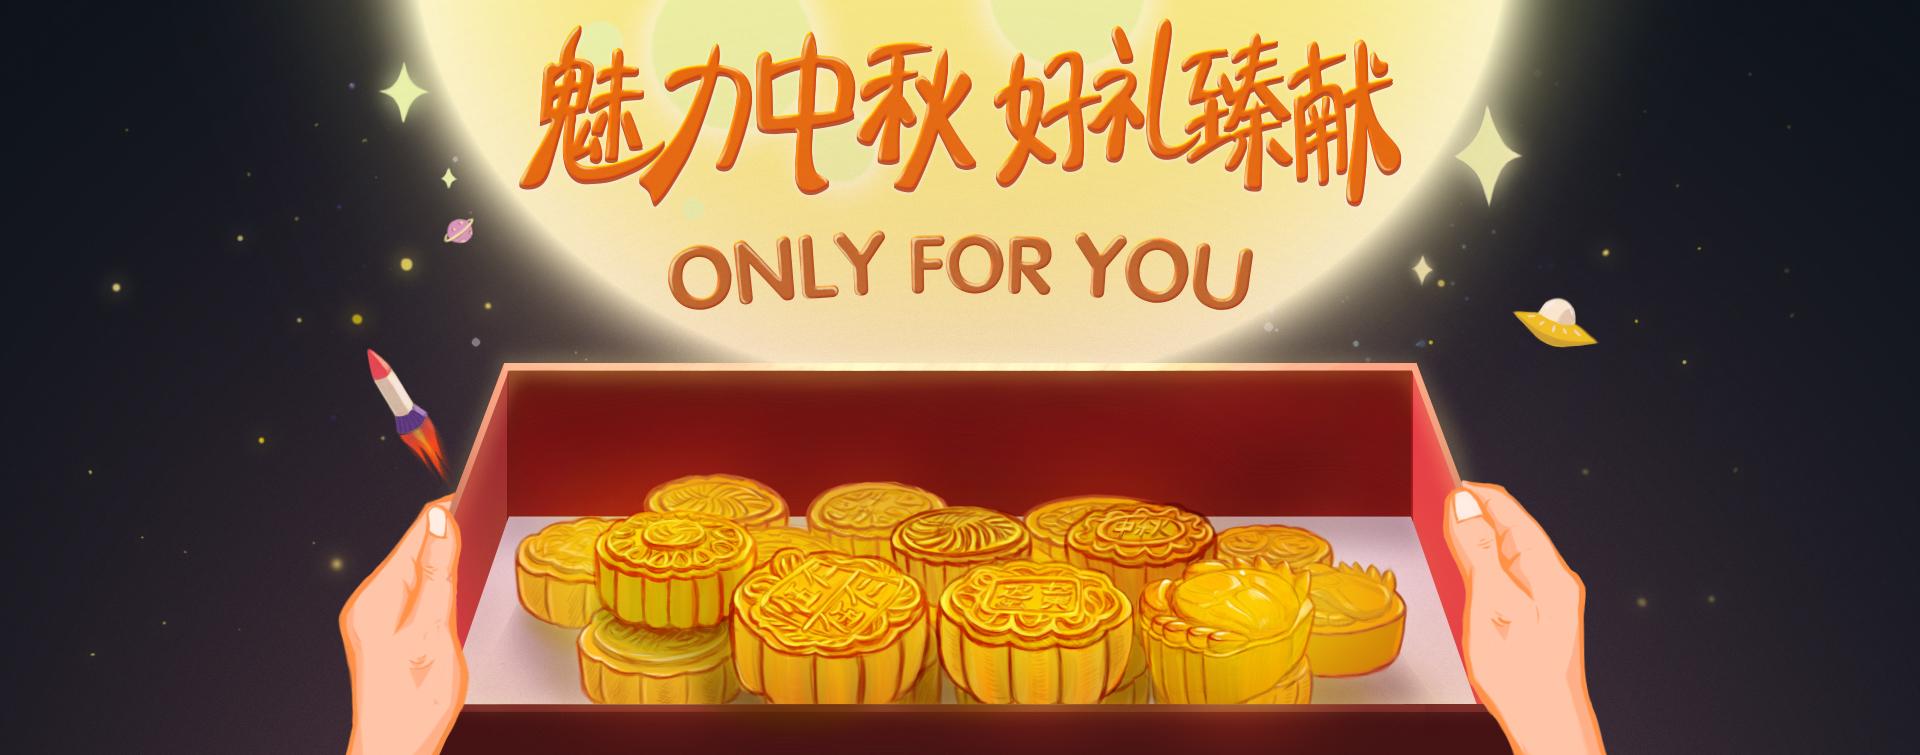 手绘中秋节月饼活动banner